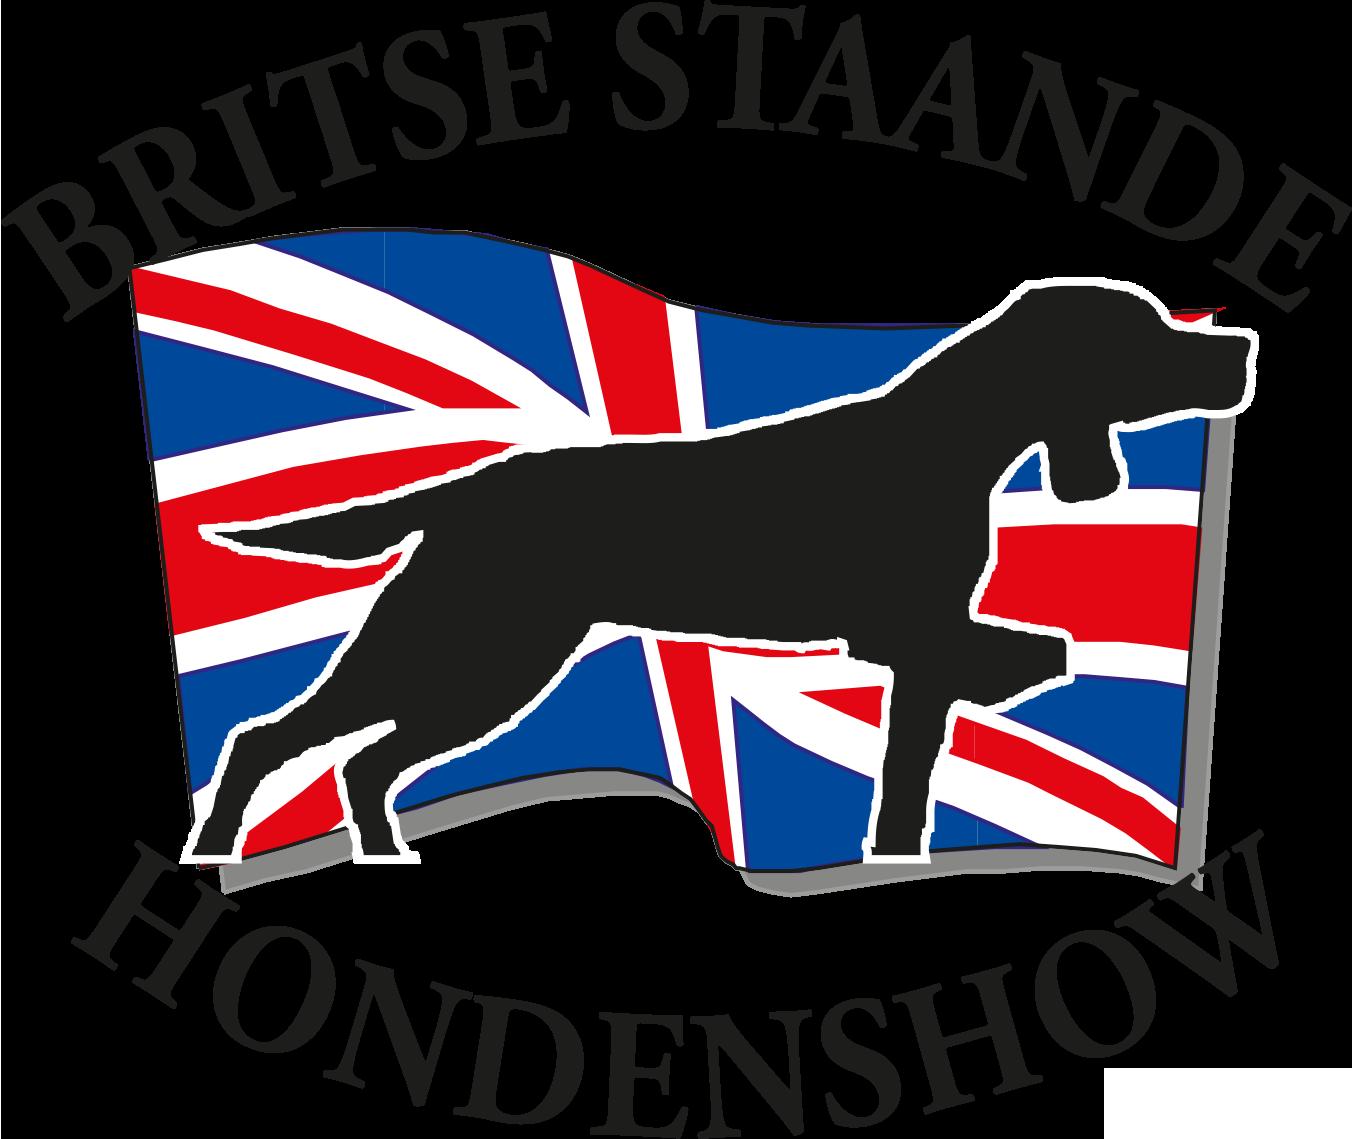 Britse Staande Hondenshow